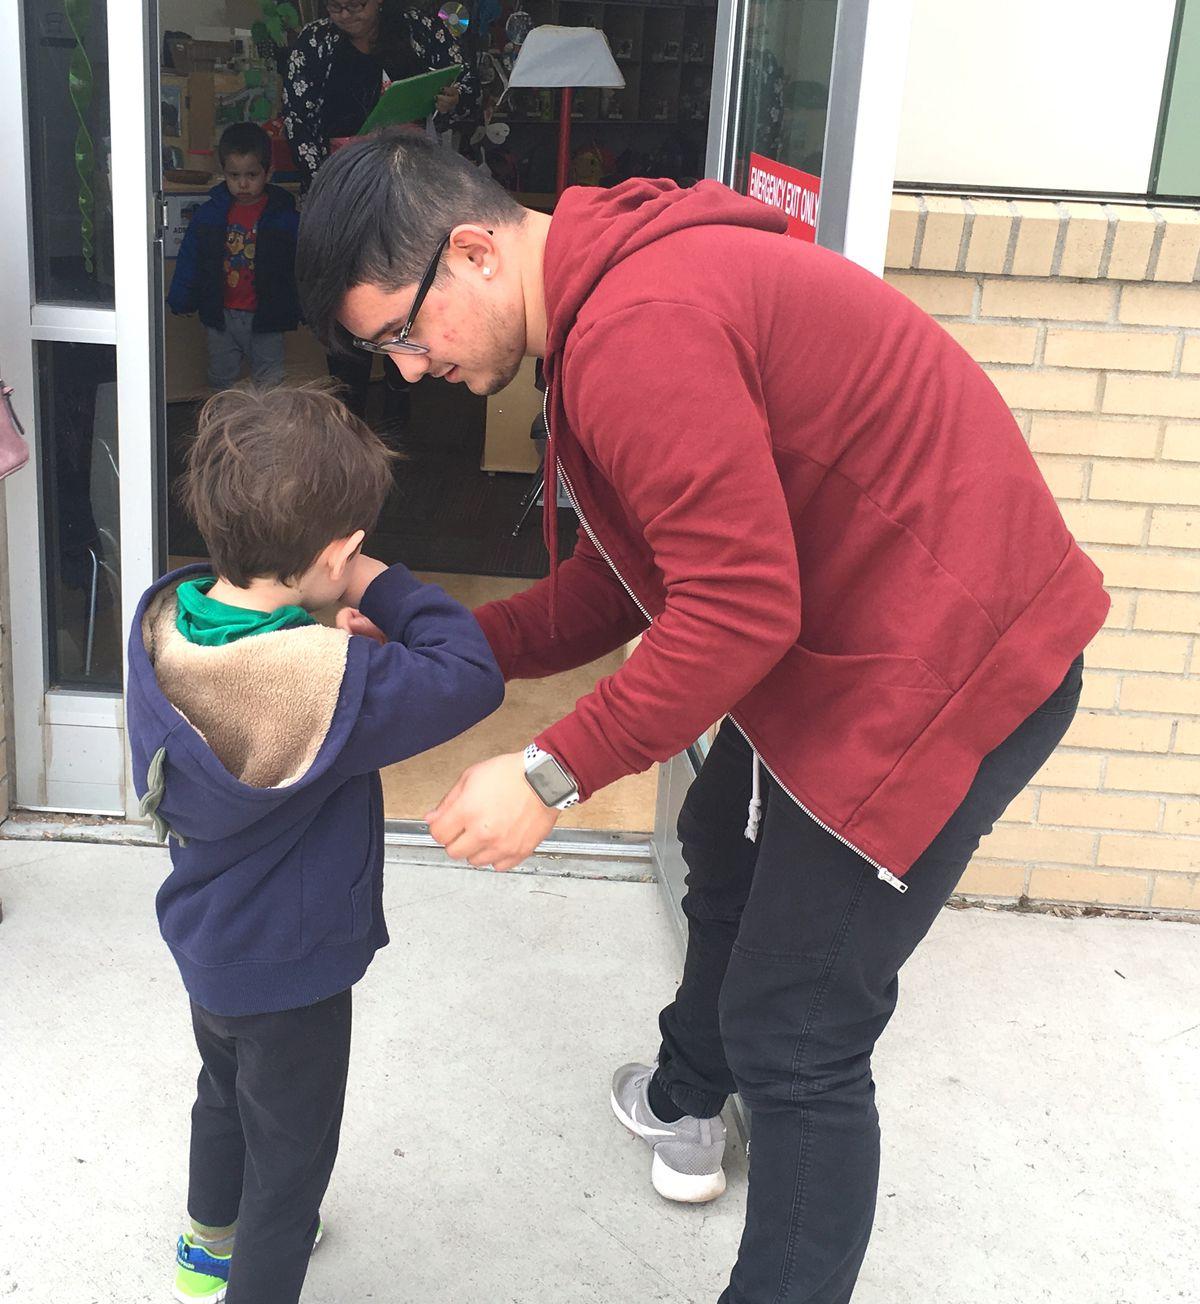 Julian Salazar, 18, helps a preschooler with his jacket during his internship.